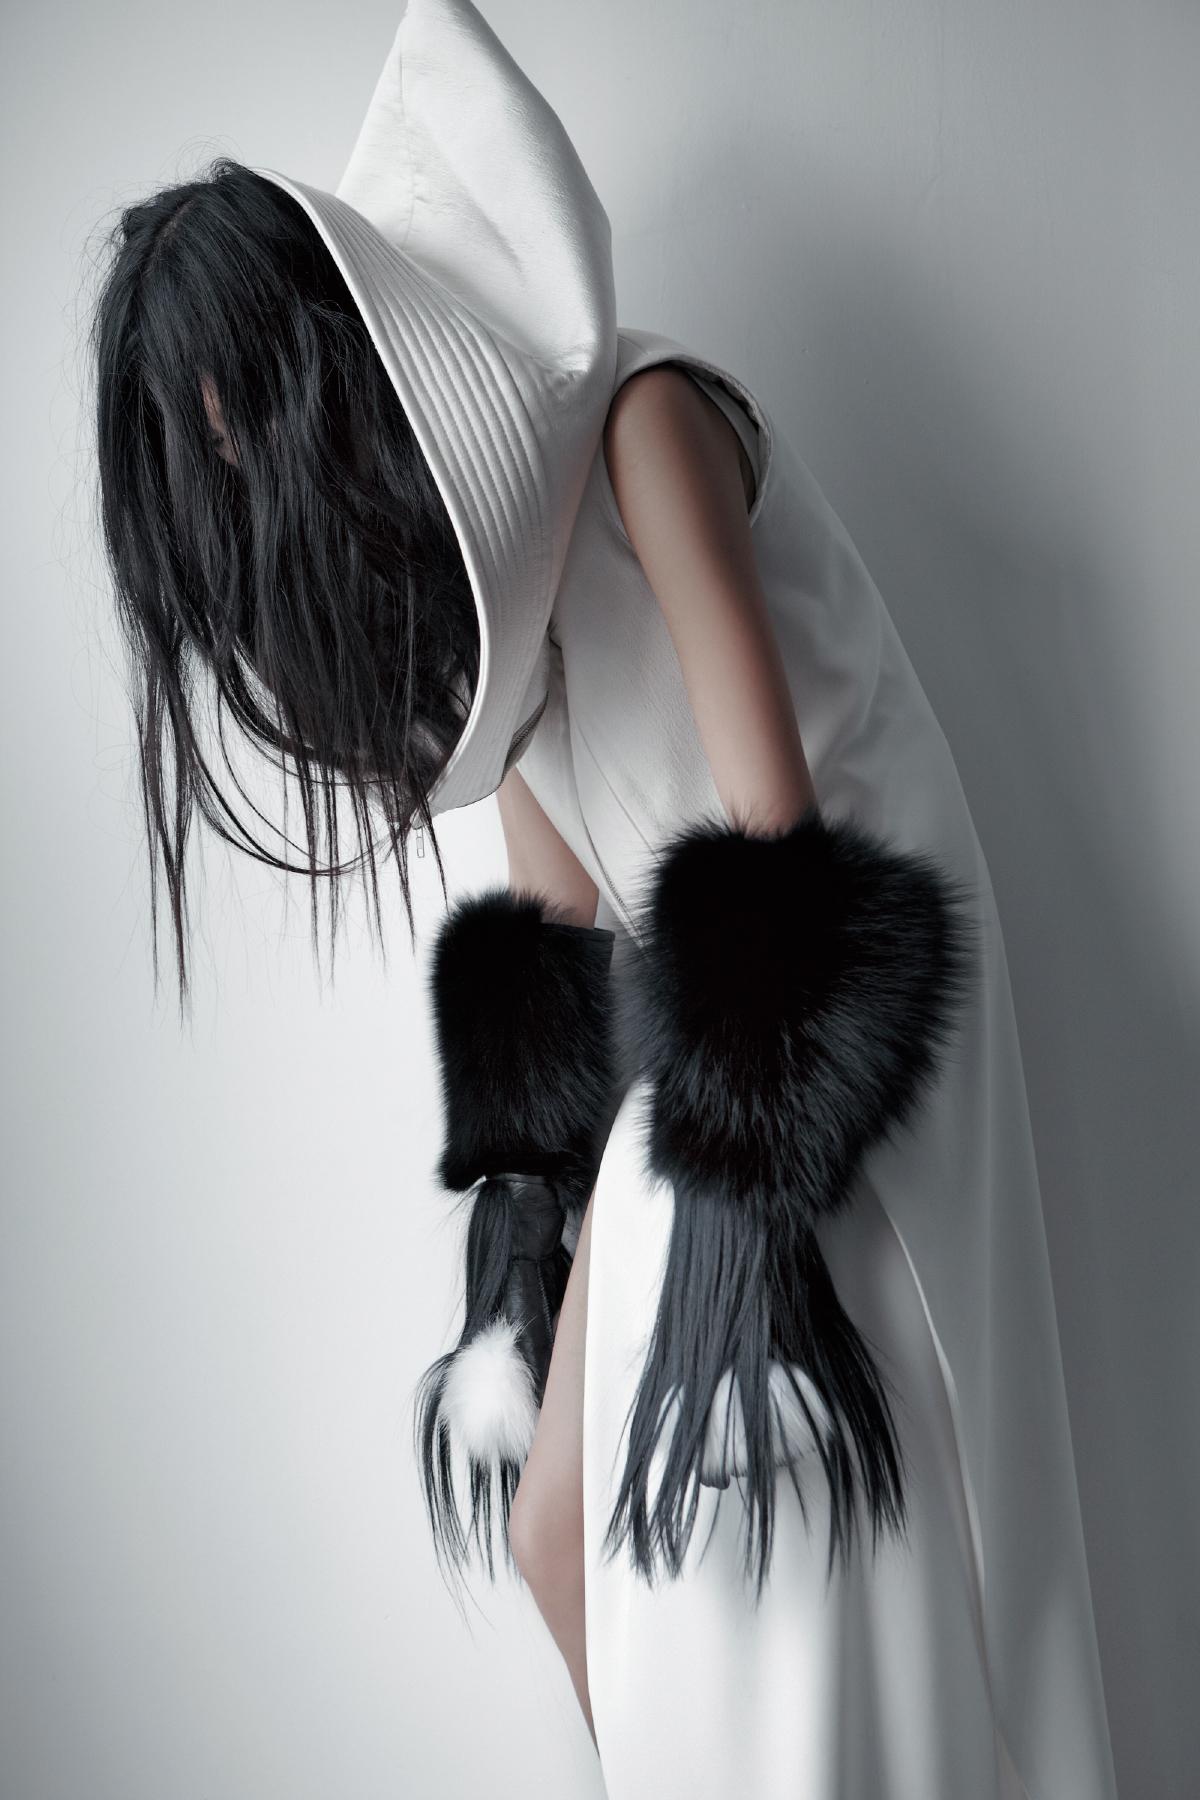 Qiu hao fashion designer